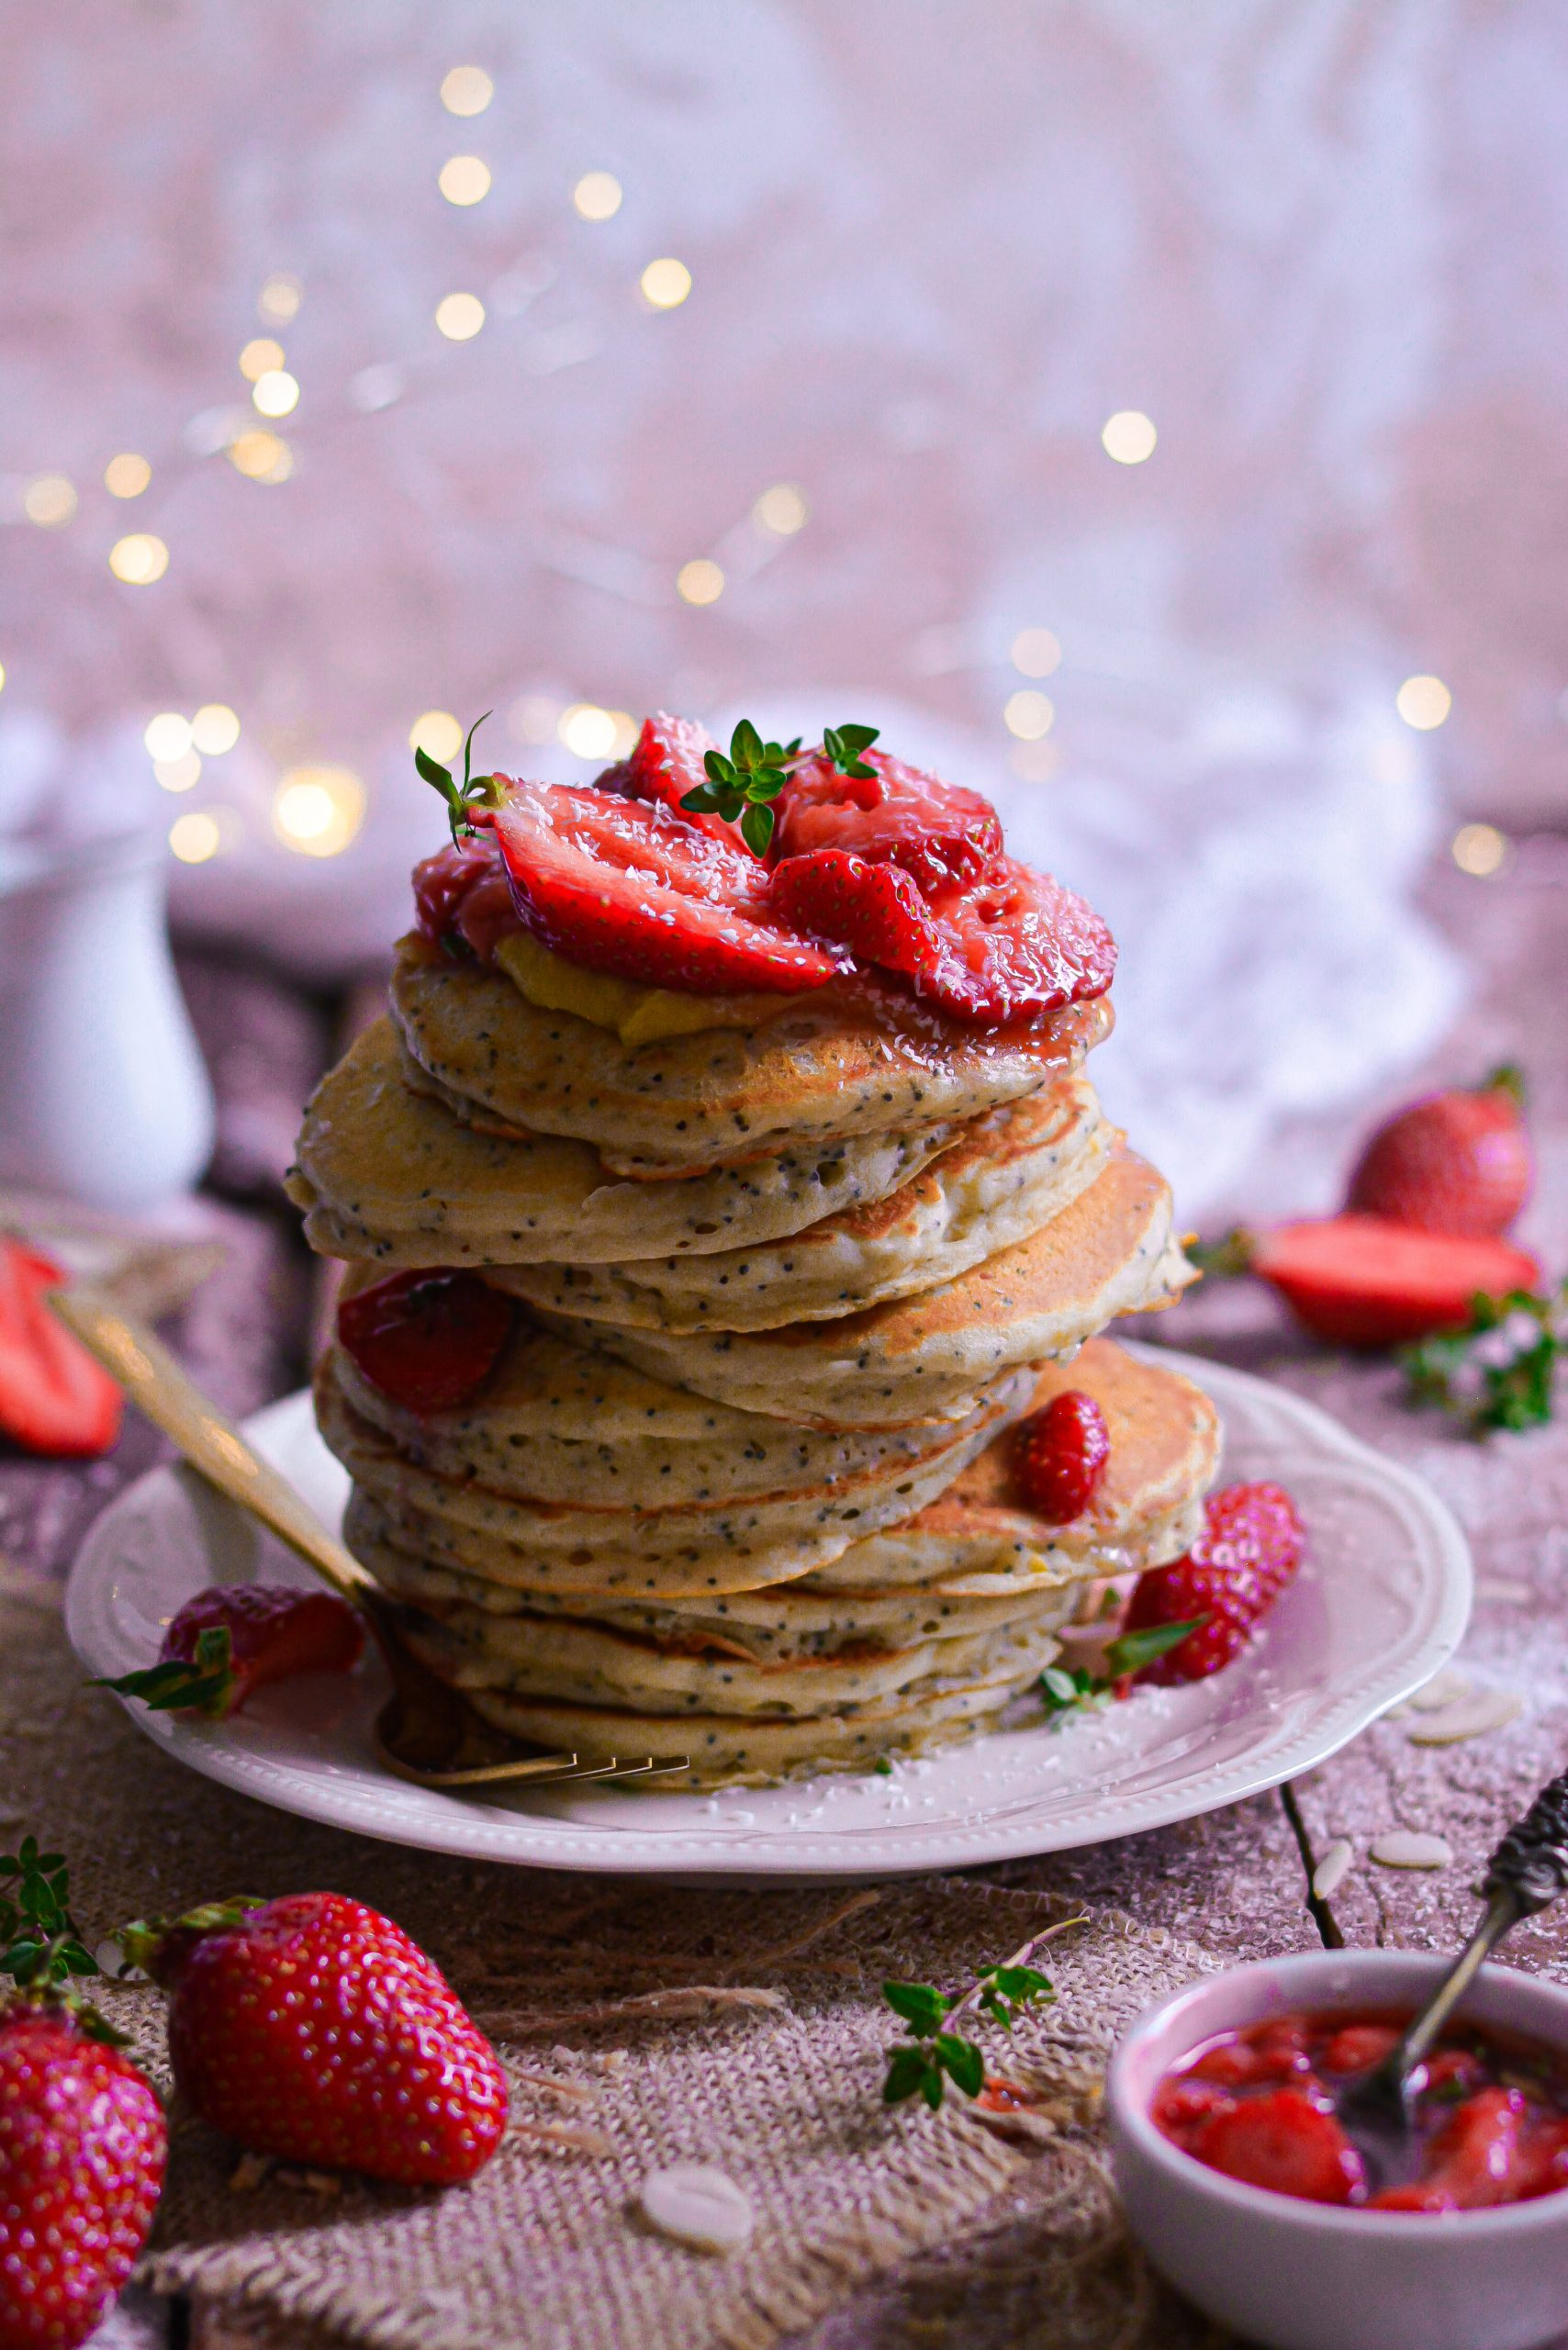 Pancakes Vegan Citron, Graines de Pavot / Vegan Lemon, Poppy Seeds Pancakes